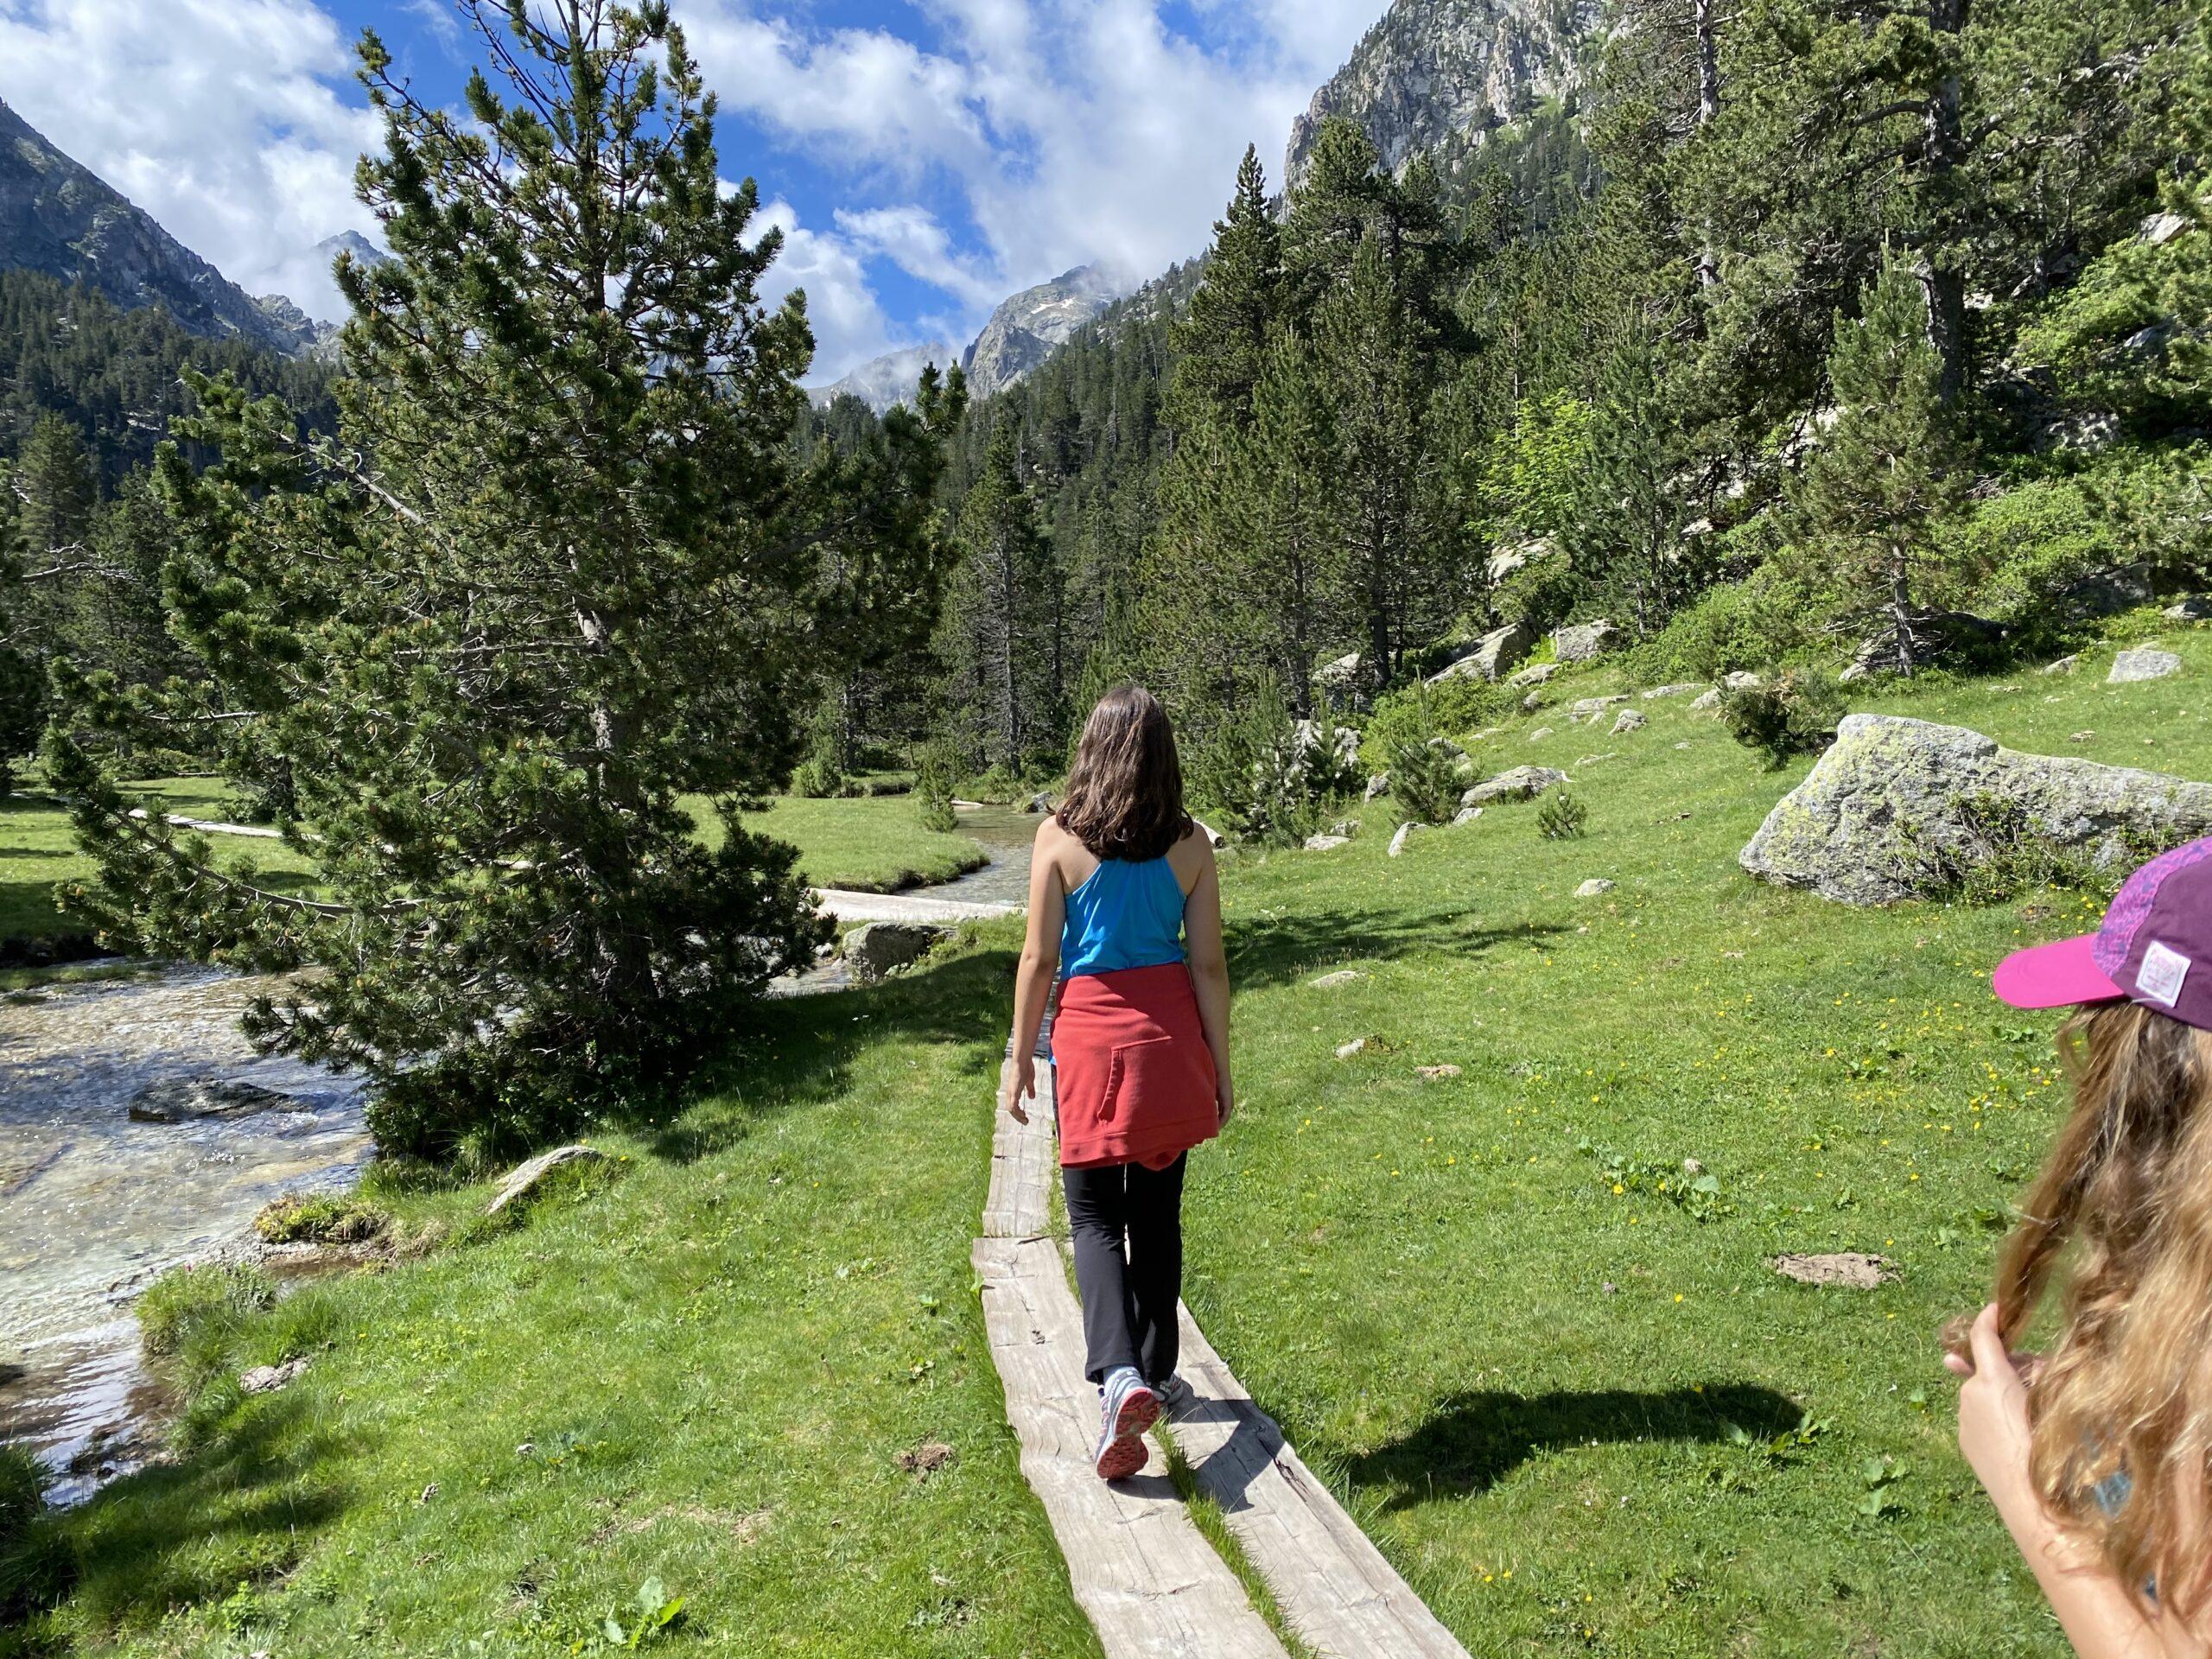 Monastero -Parc Nacional